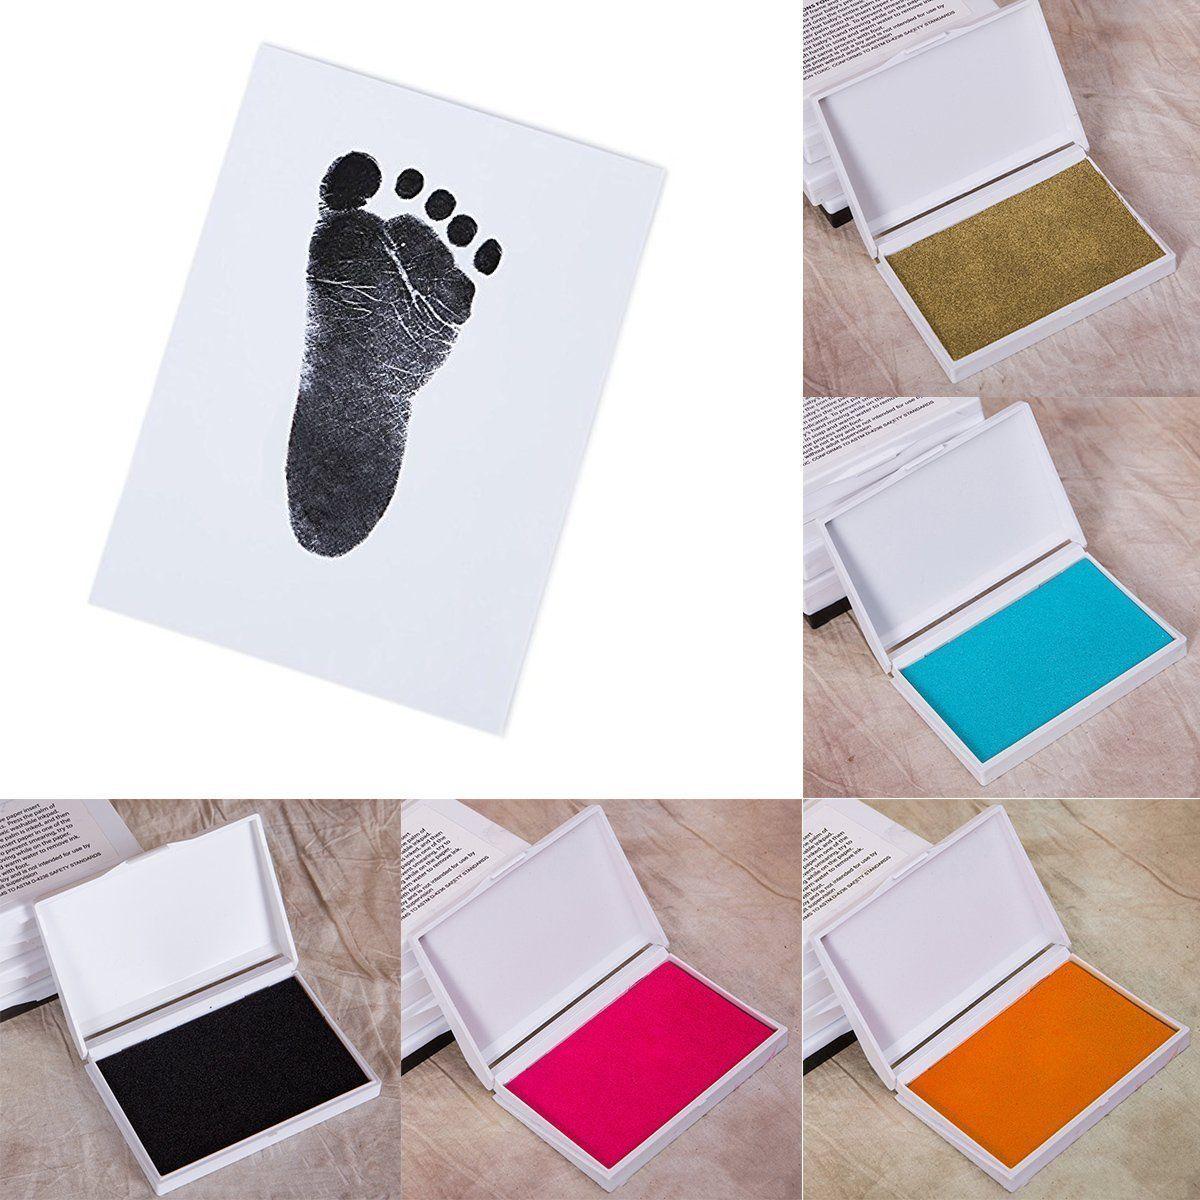 Baby Paw Print Pad Foot Print Photo Frame Creative Touch Ink Pad Baby Items Souvenir Gift Baby Handprint Footprint Imprint Kit